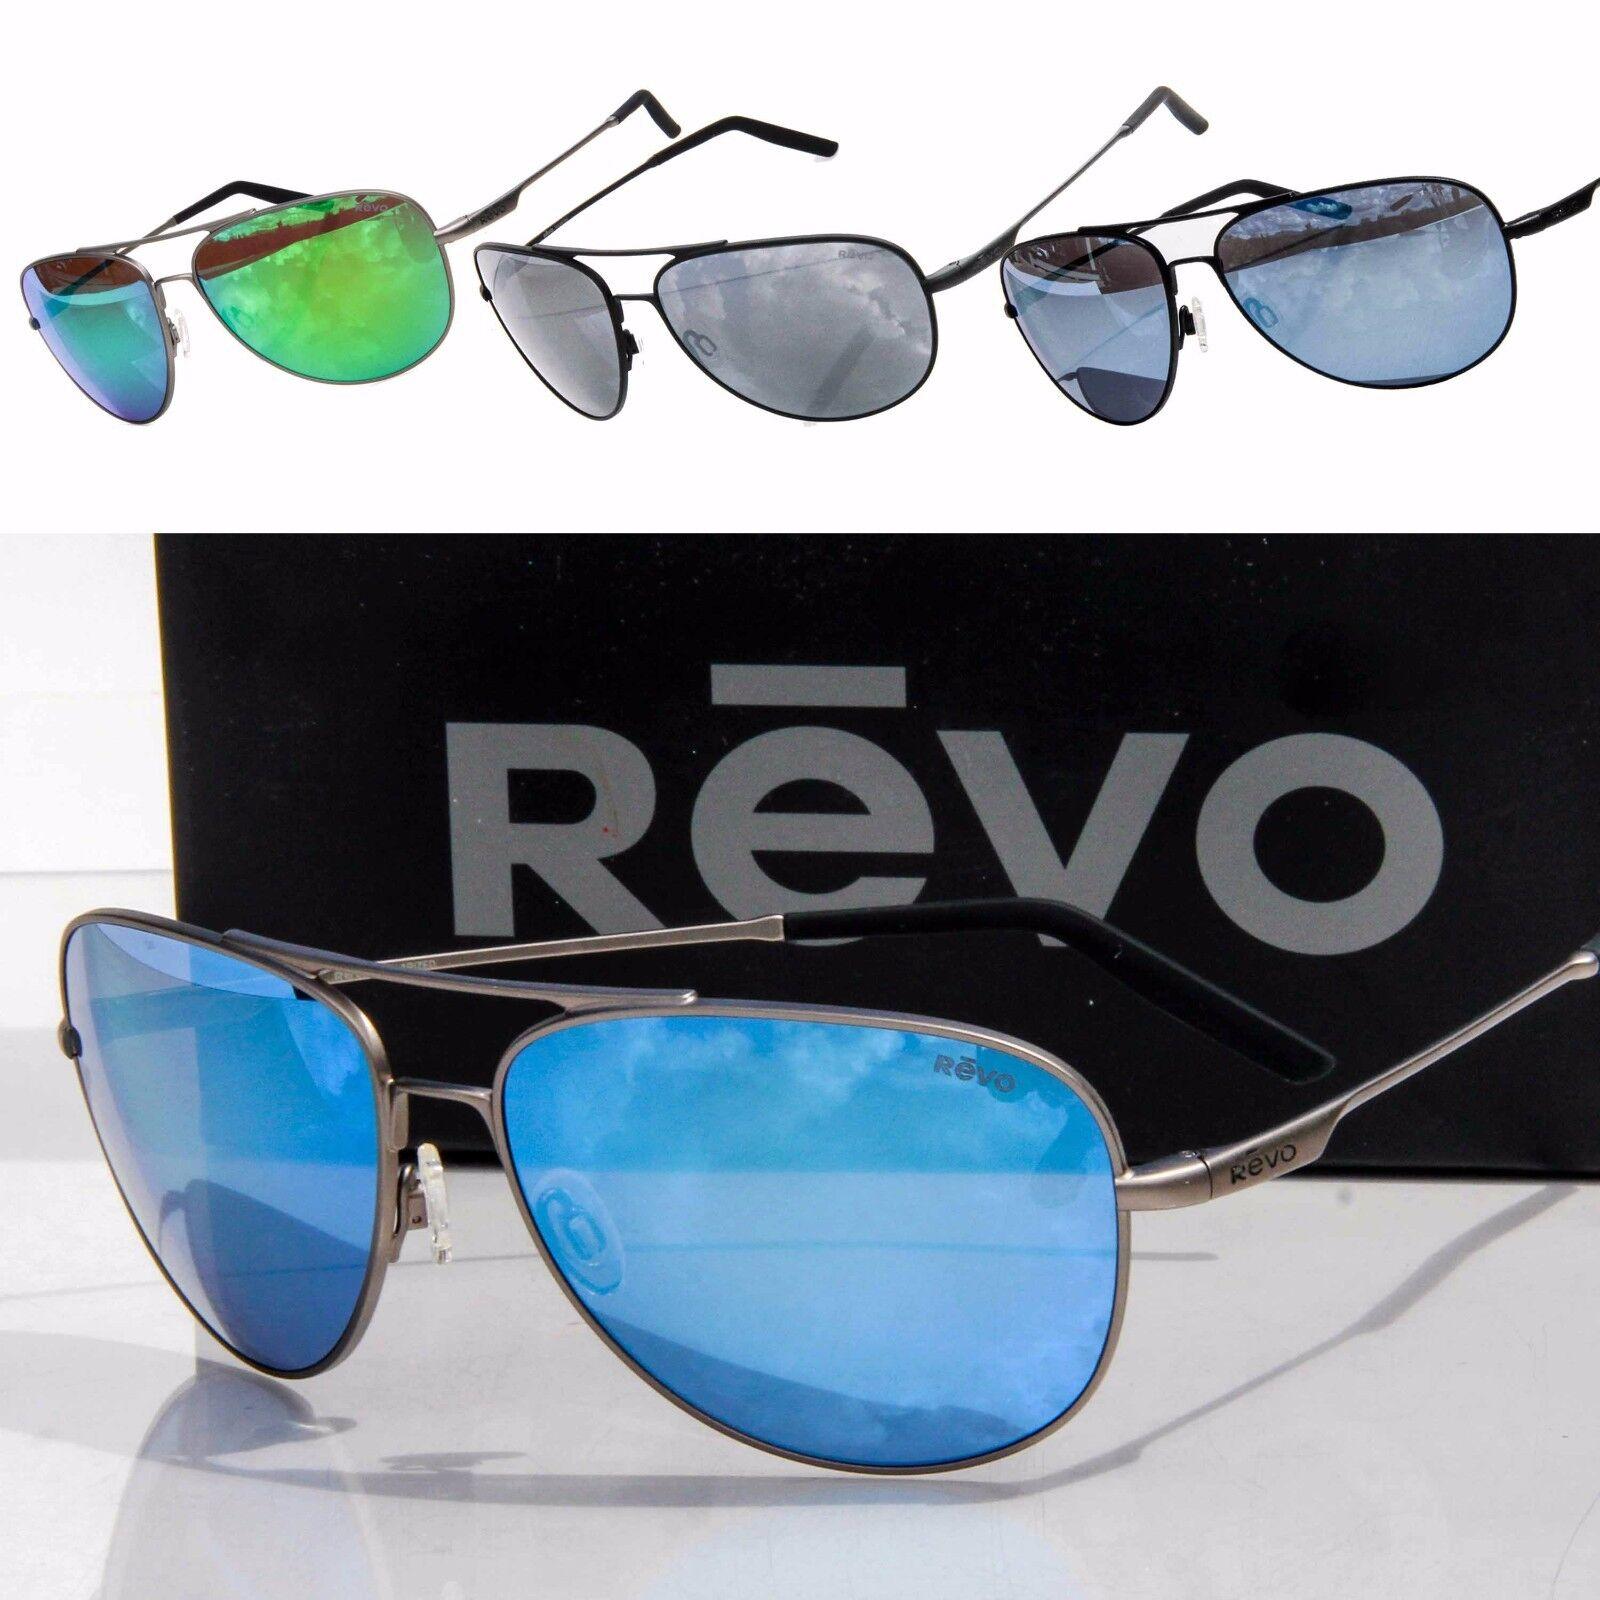 f0d598aea35 NEW REVO WINDSPEED POLARIZED SUNGLASSES Choose Your Color CRYSTAL Glass  Lens 아이템 넘버  282558357015.